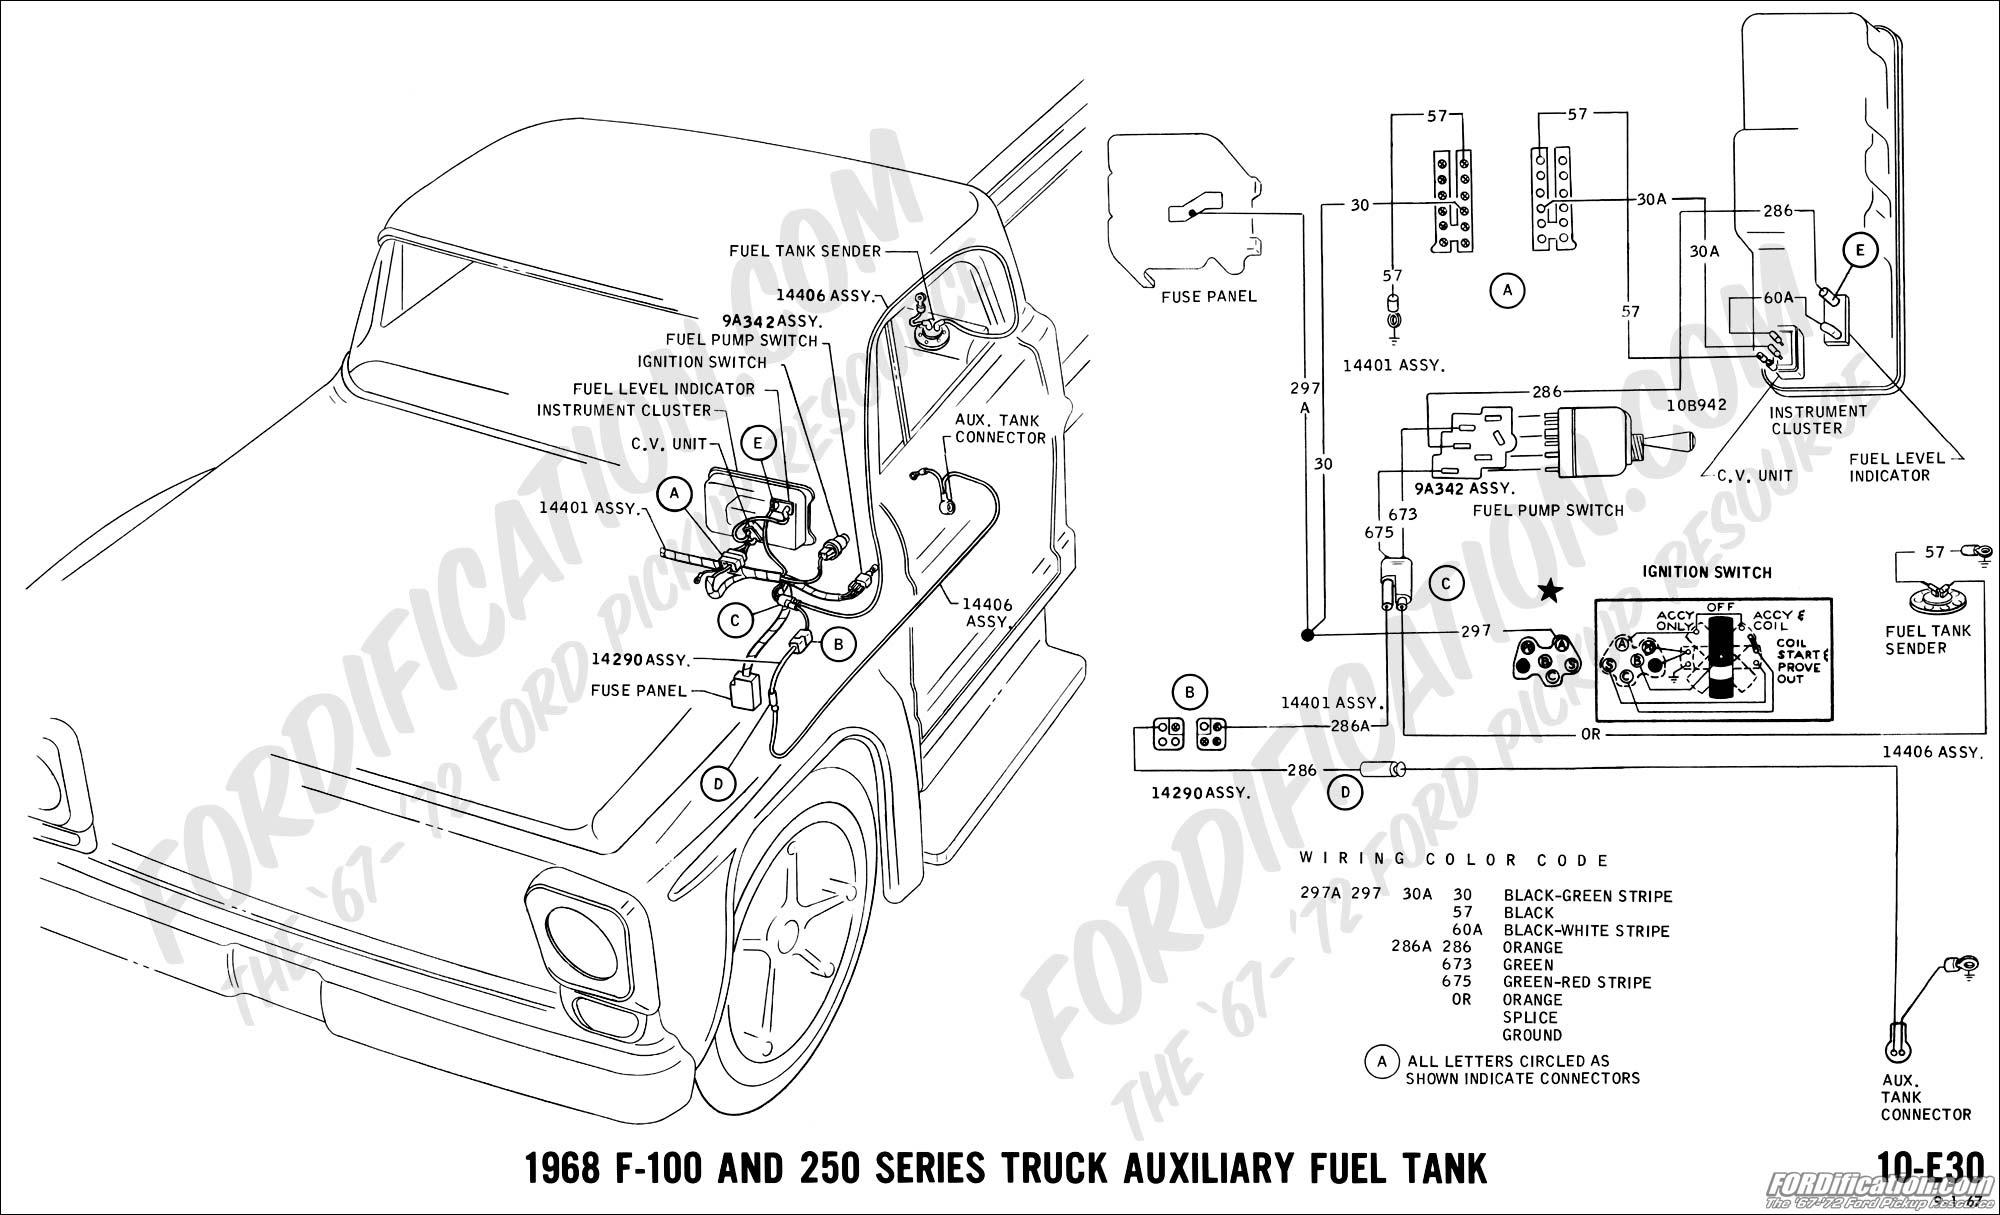 1968 Ford F100 Fuel Gauge Wiring Diagram Shovelhead Ignition Wiring Diagram Rccar Wiring 2010menanti Jeanjaures37 Fr